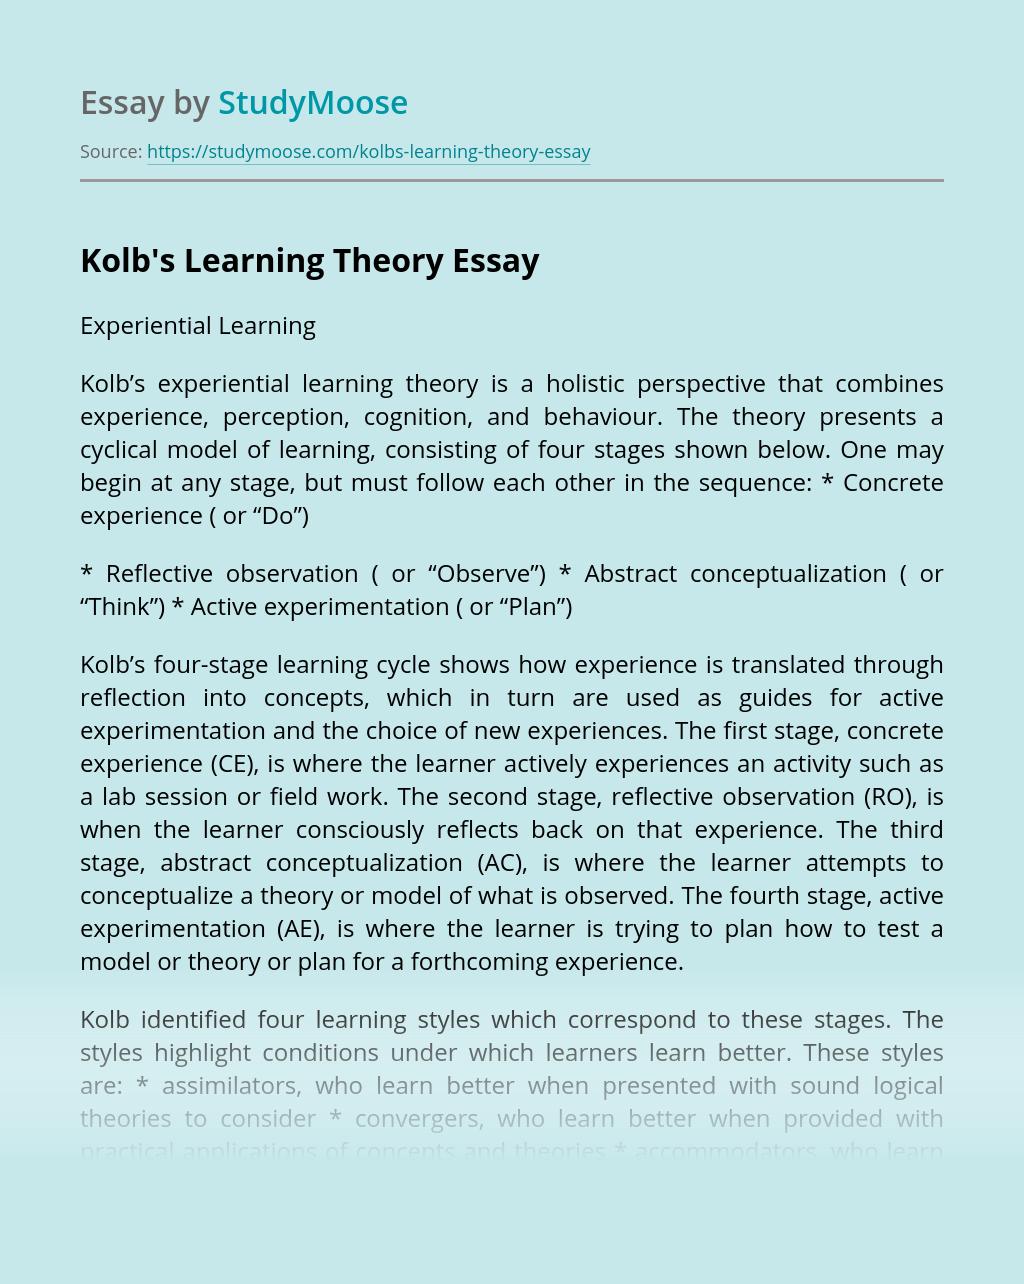 Kolb's Learning Theory